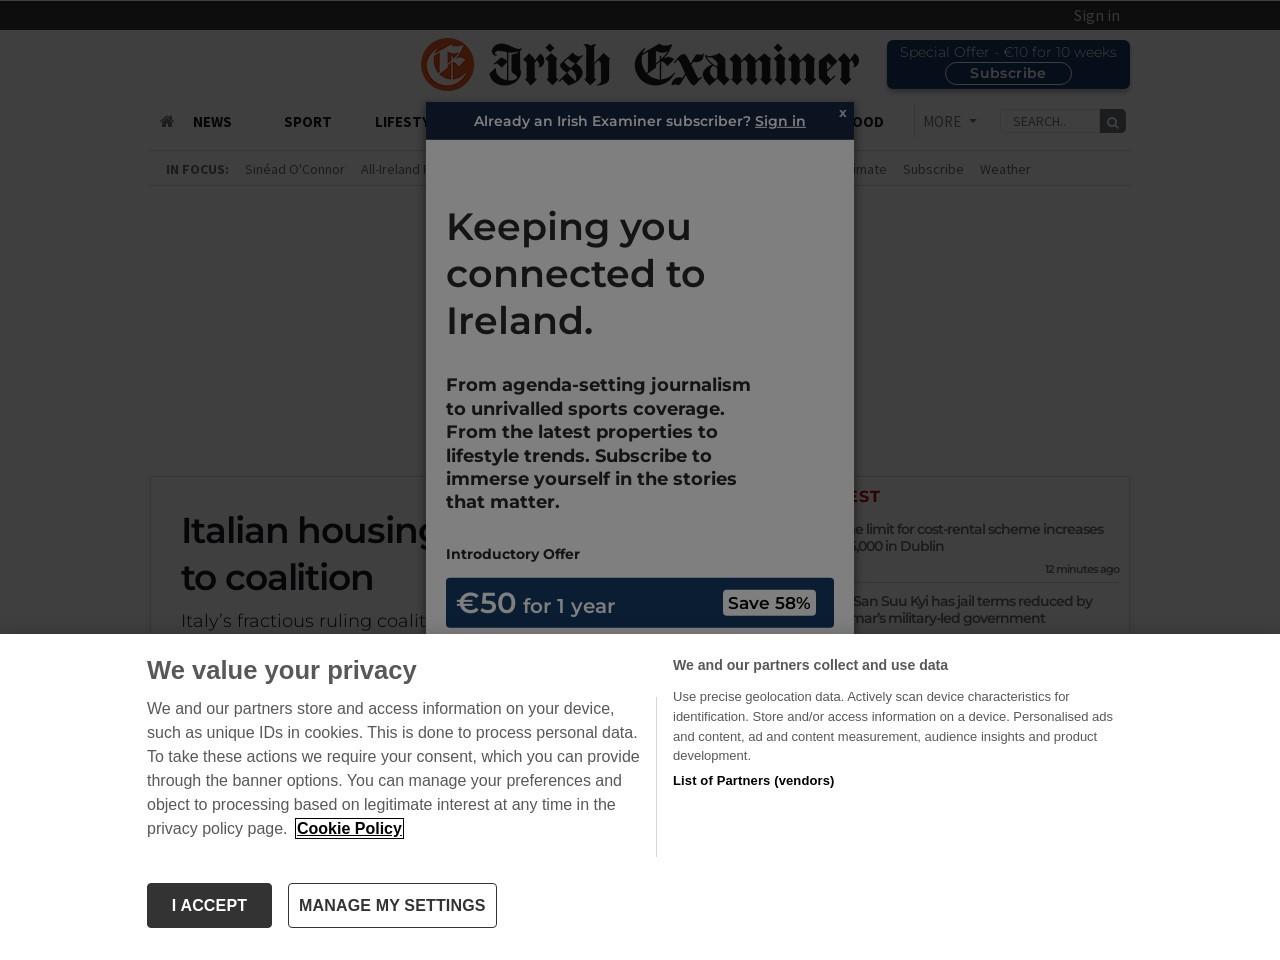 Italian housing tax fresh threat to coalition